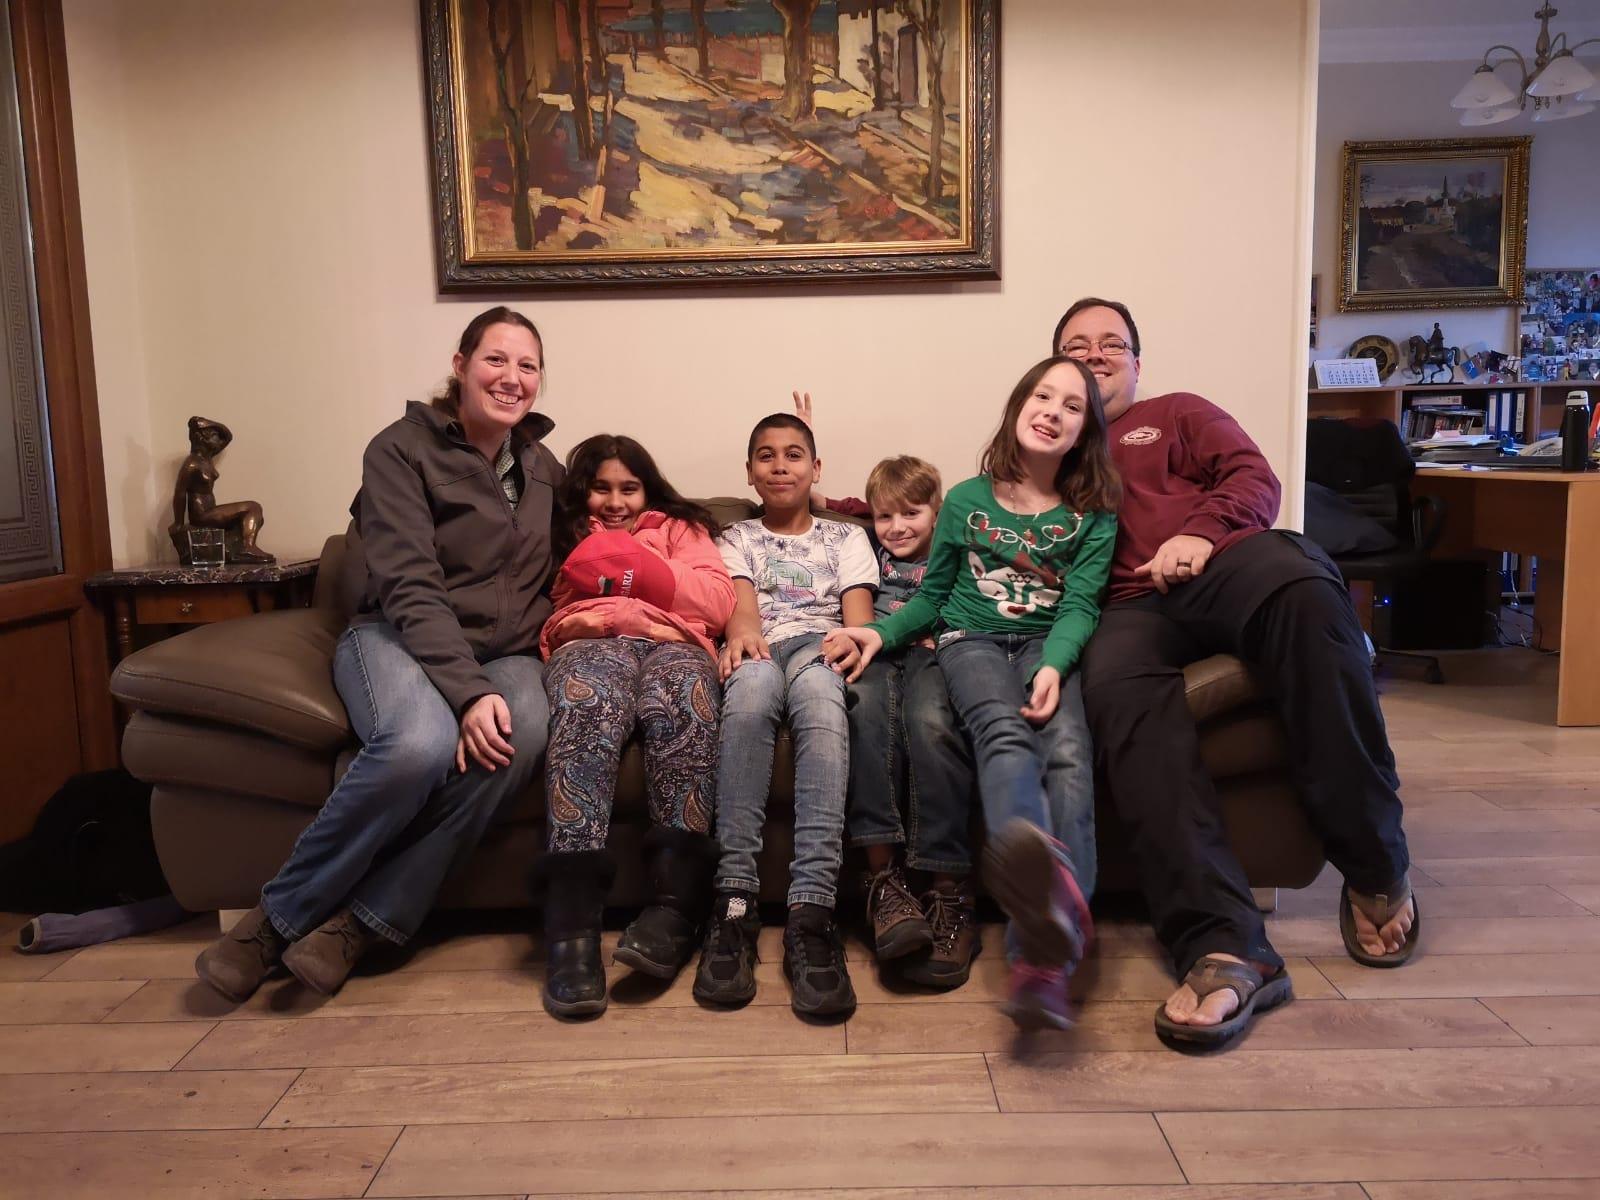 Achieve Adoption Founding Family - The Dingler Family